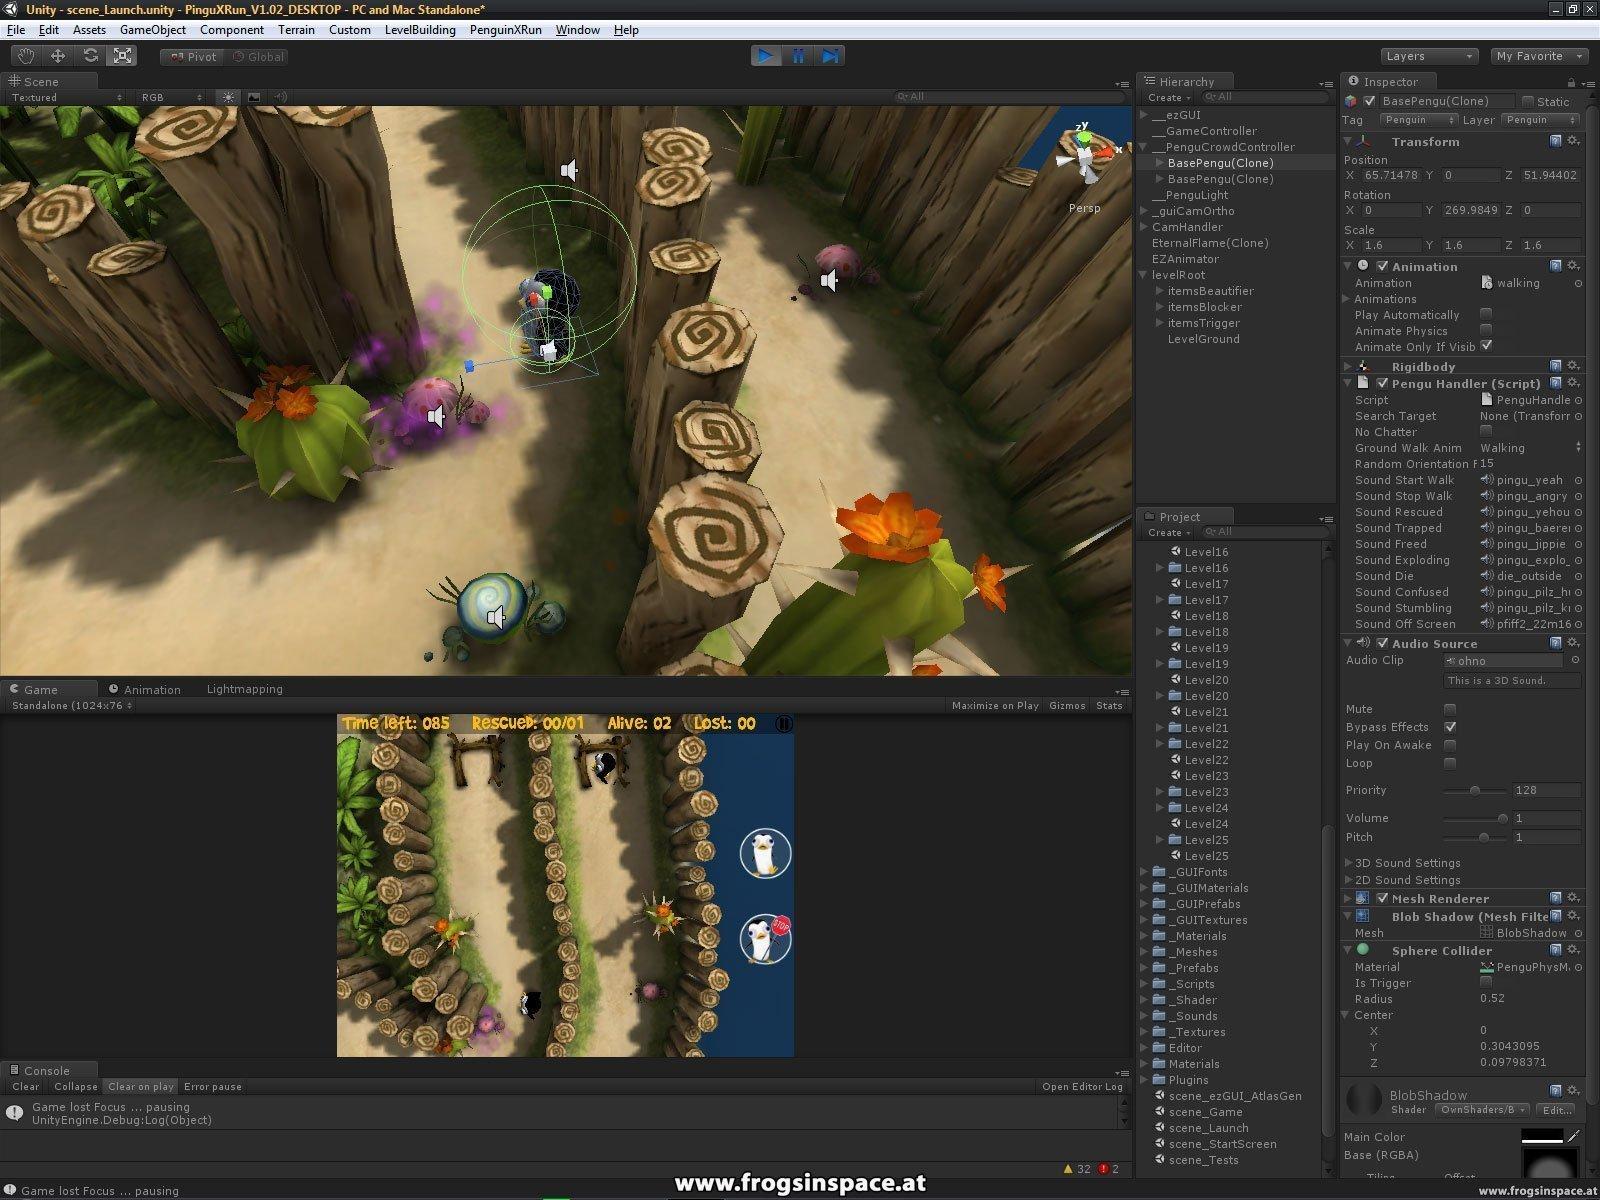 Unity Editor: Level loaded